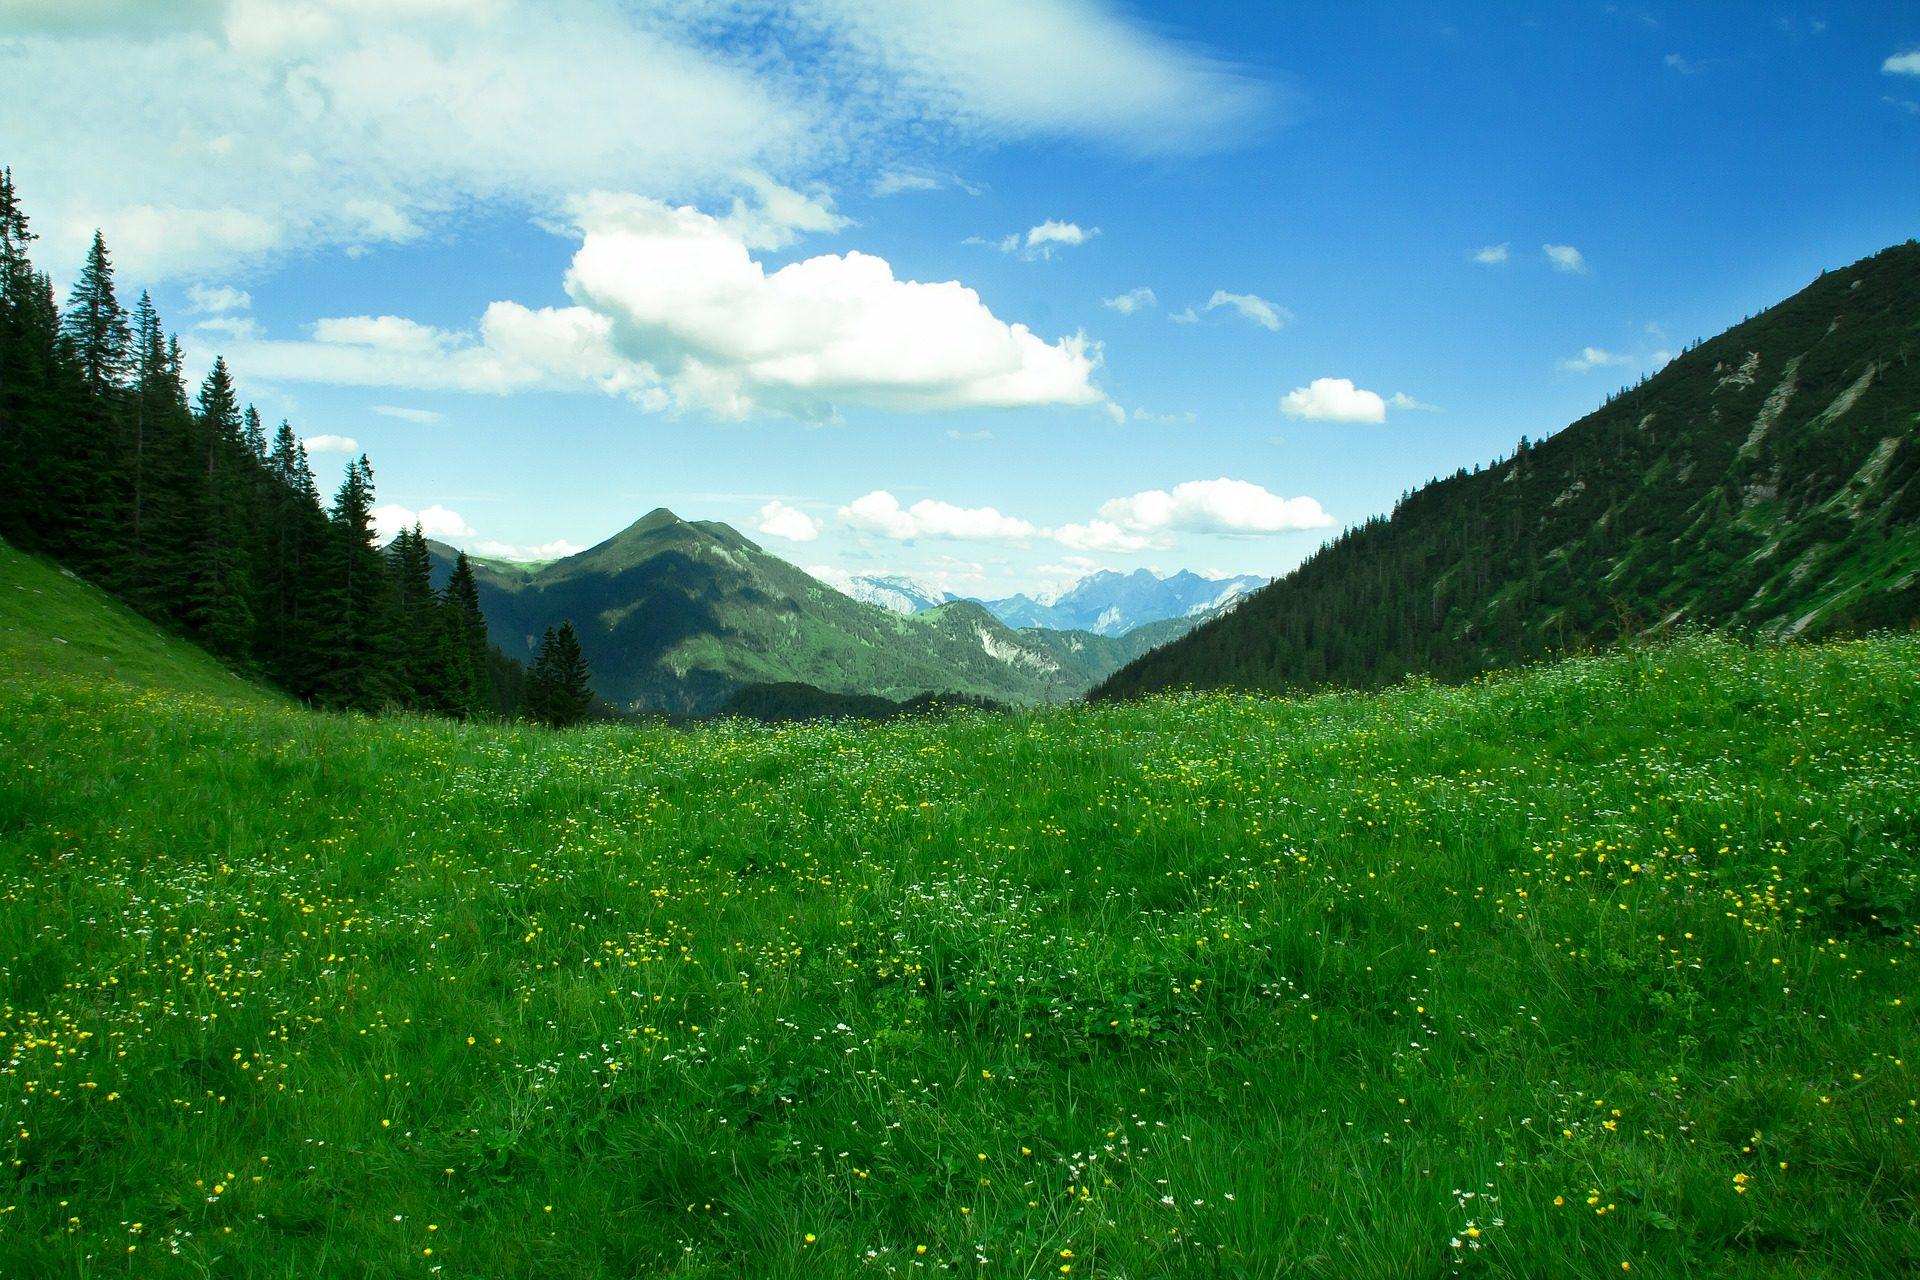 Montañas, PRADO, Pradera, फूल, घास, पेड़, मनोरम - HD वॉलपेपर - प्रोफेसर-falken.com